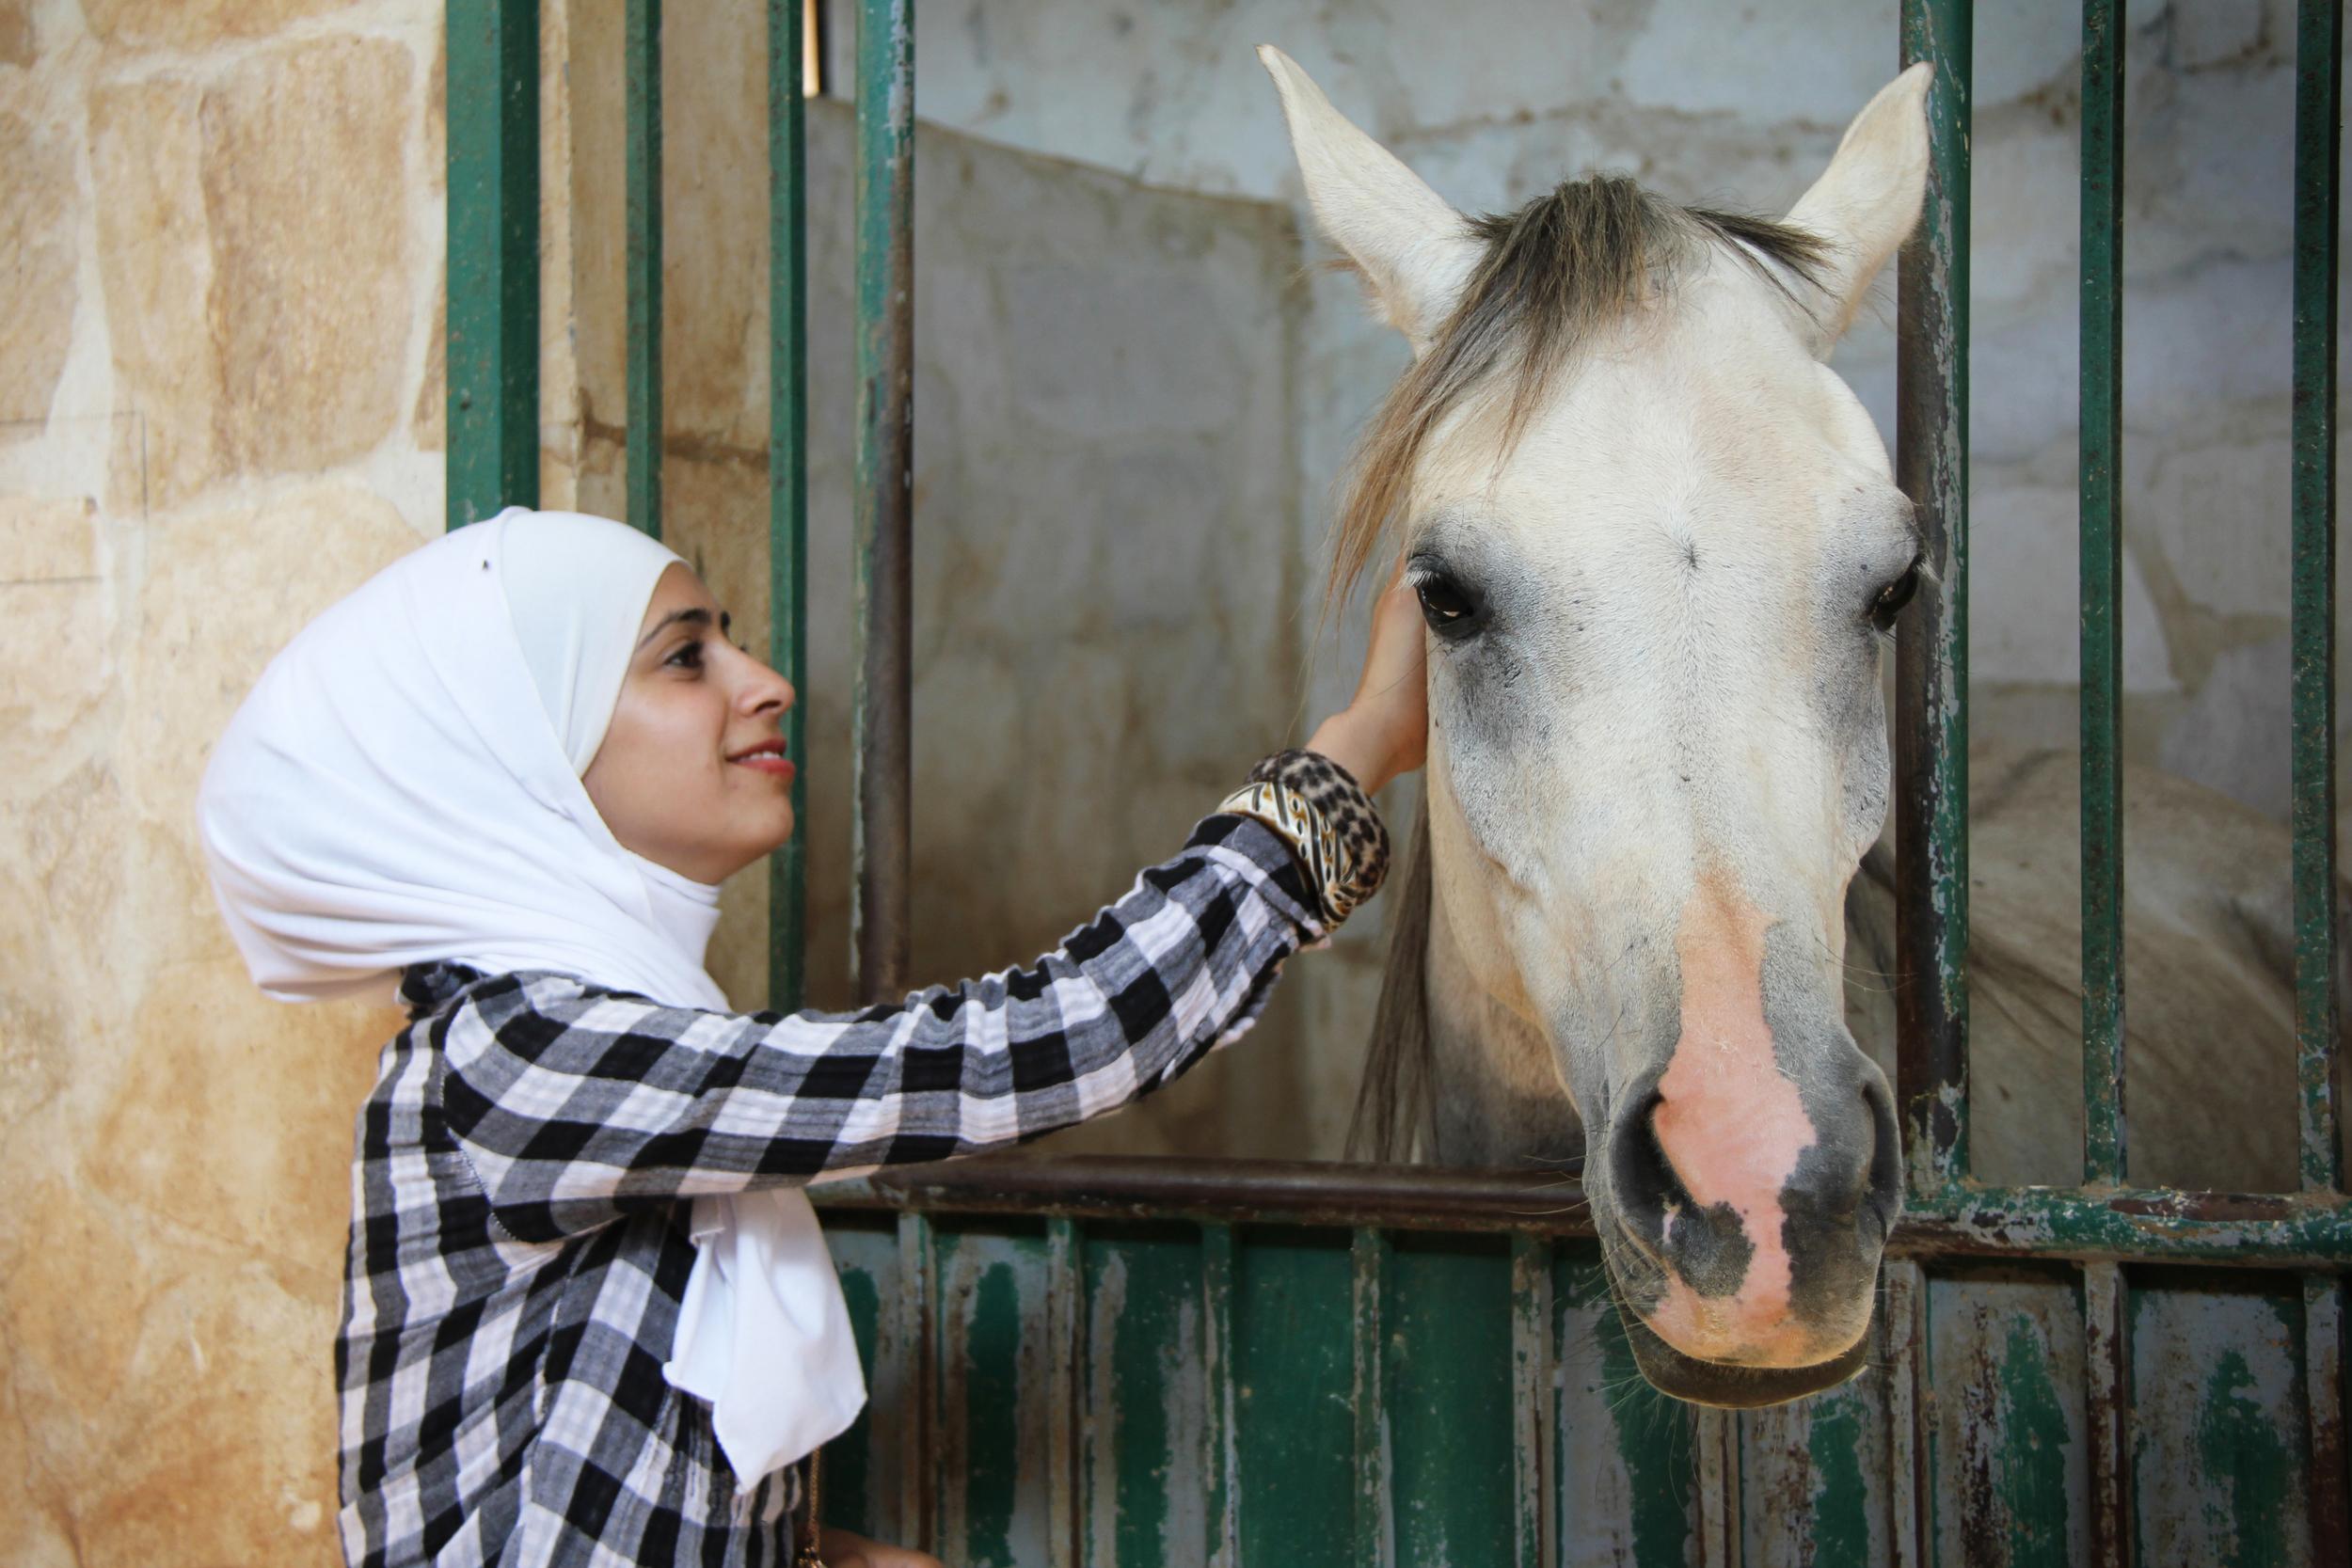 19.6.11 Ayah petting the horses in Gilead.JPG